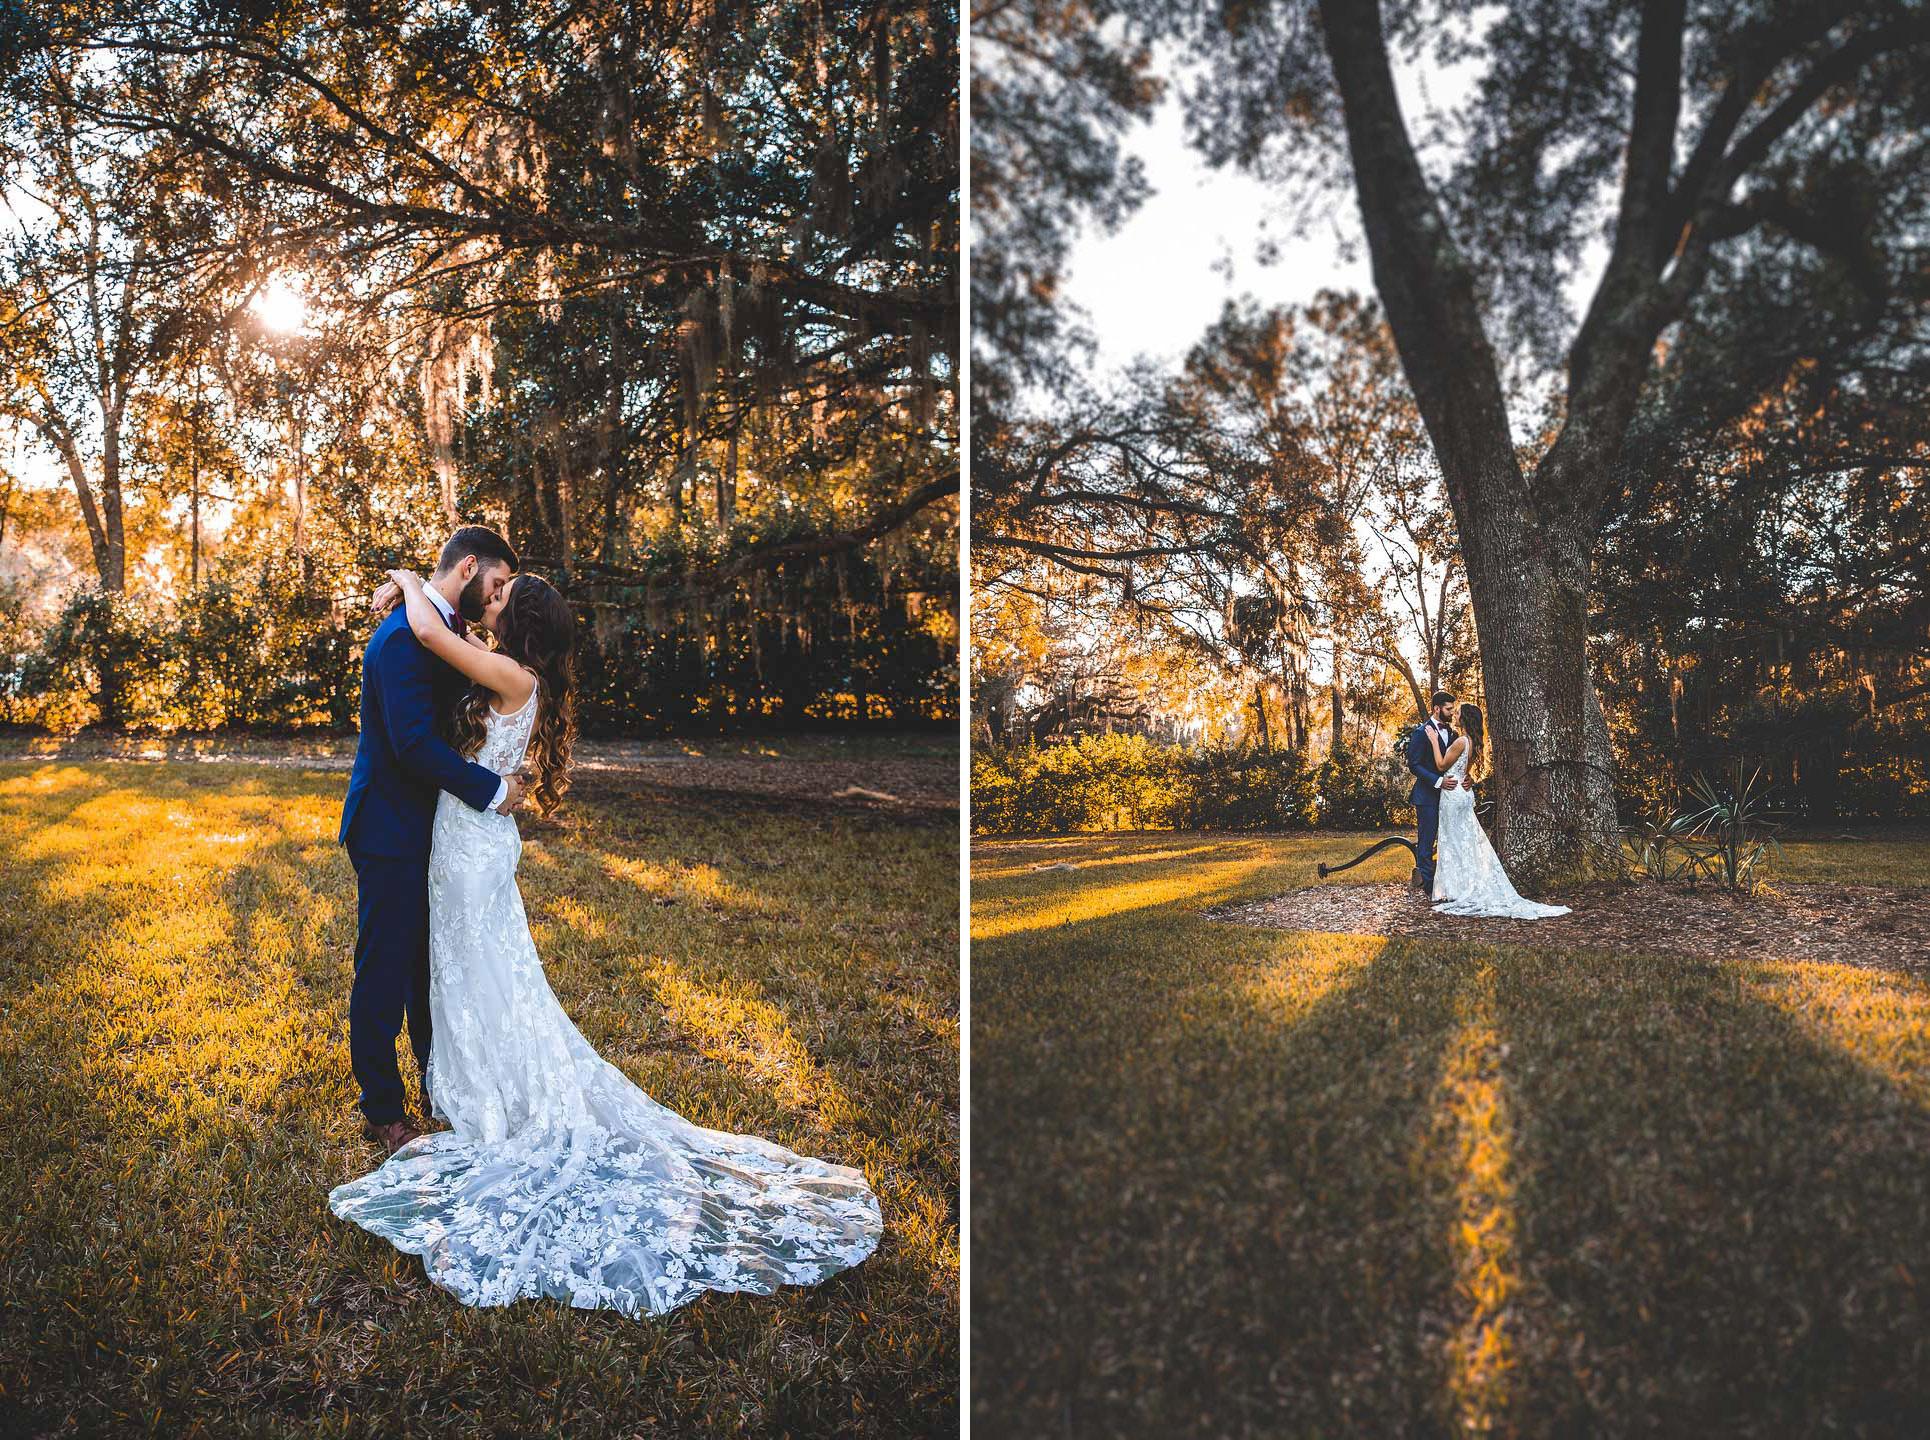 adam-szarmack-bowing-oaks-wedding-photographer-jacksonville-97.jpg